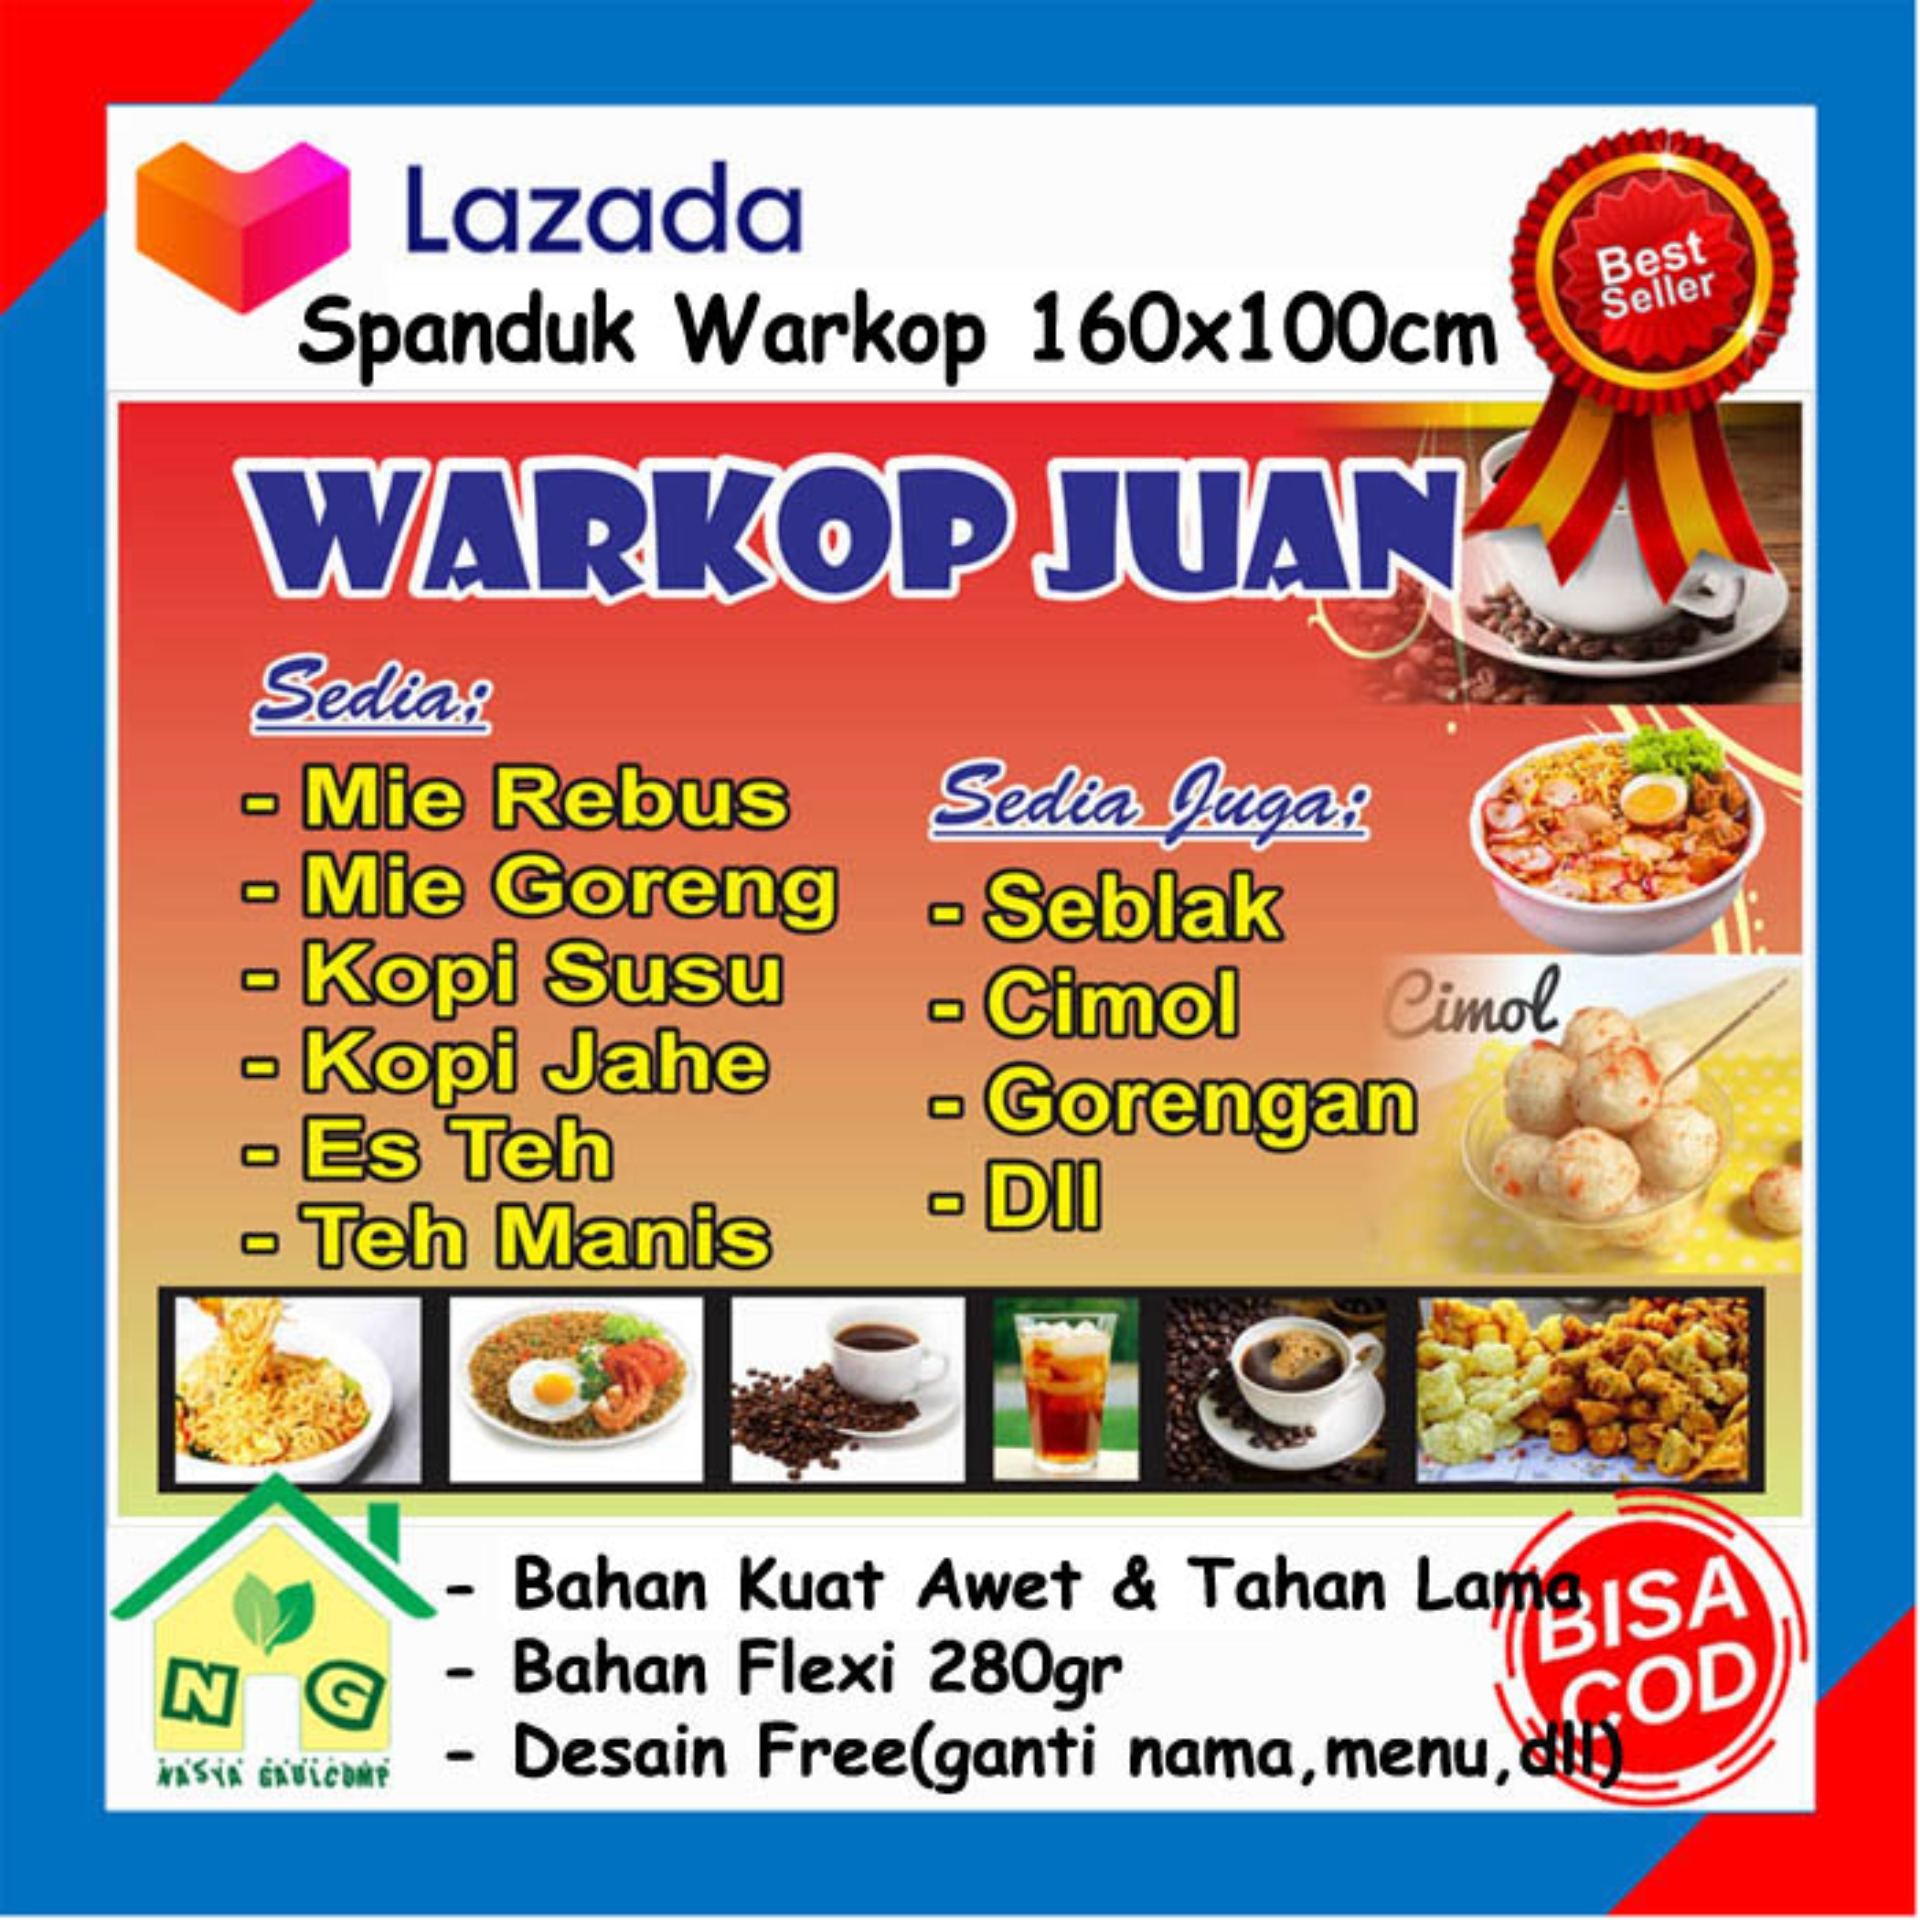 Contoh Spanduk Warkop - Jual Banner Warkop Murah Harga ...